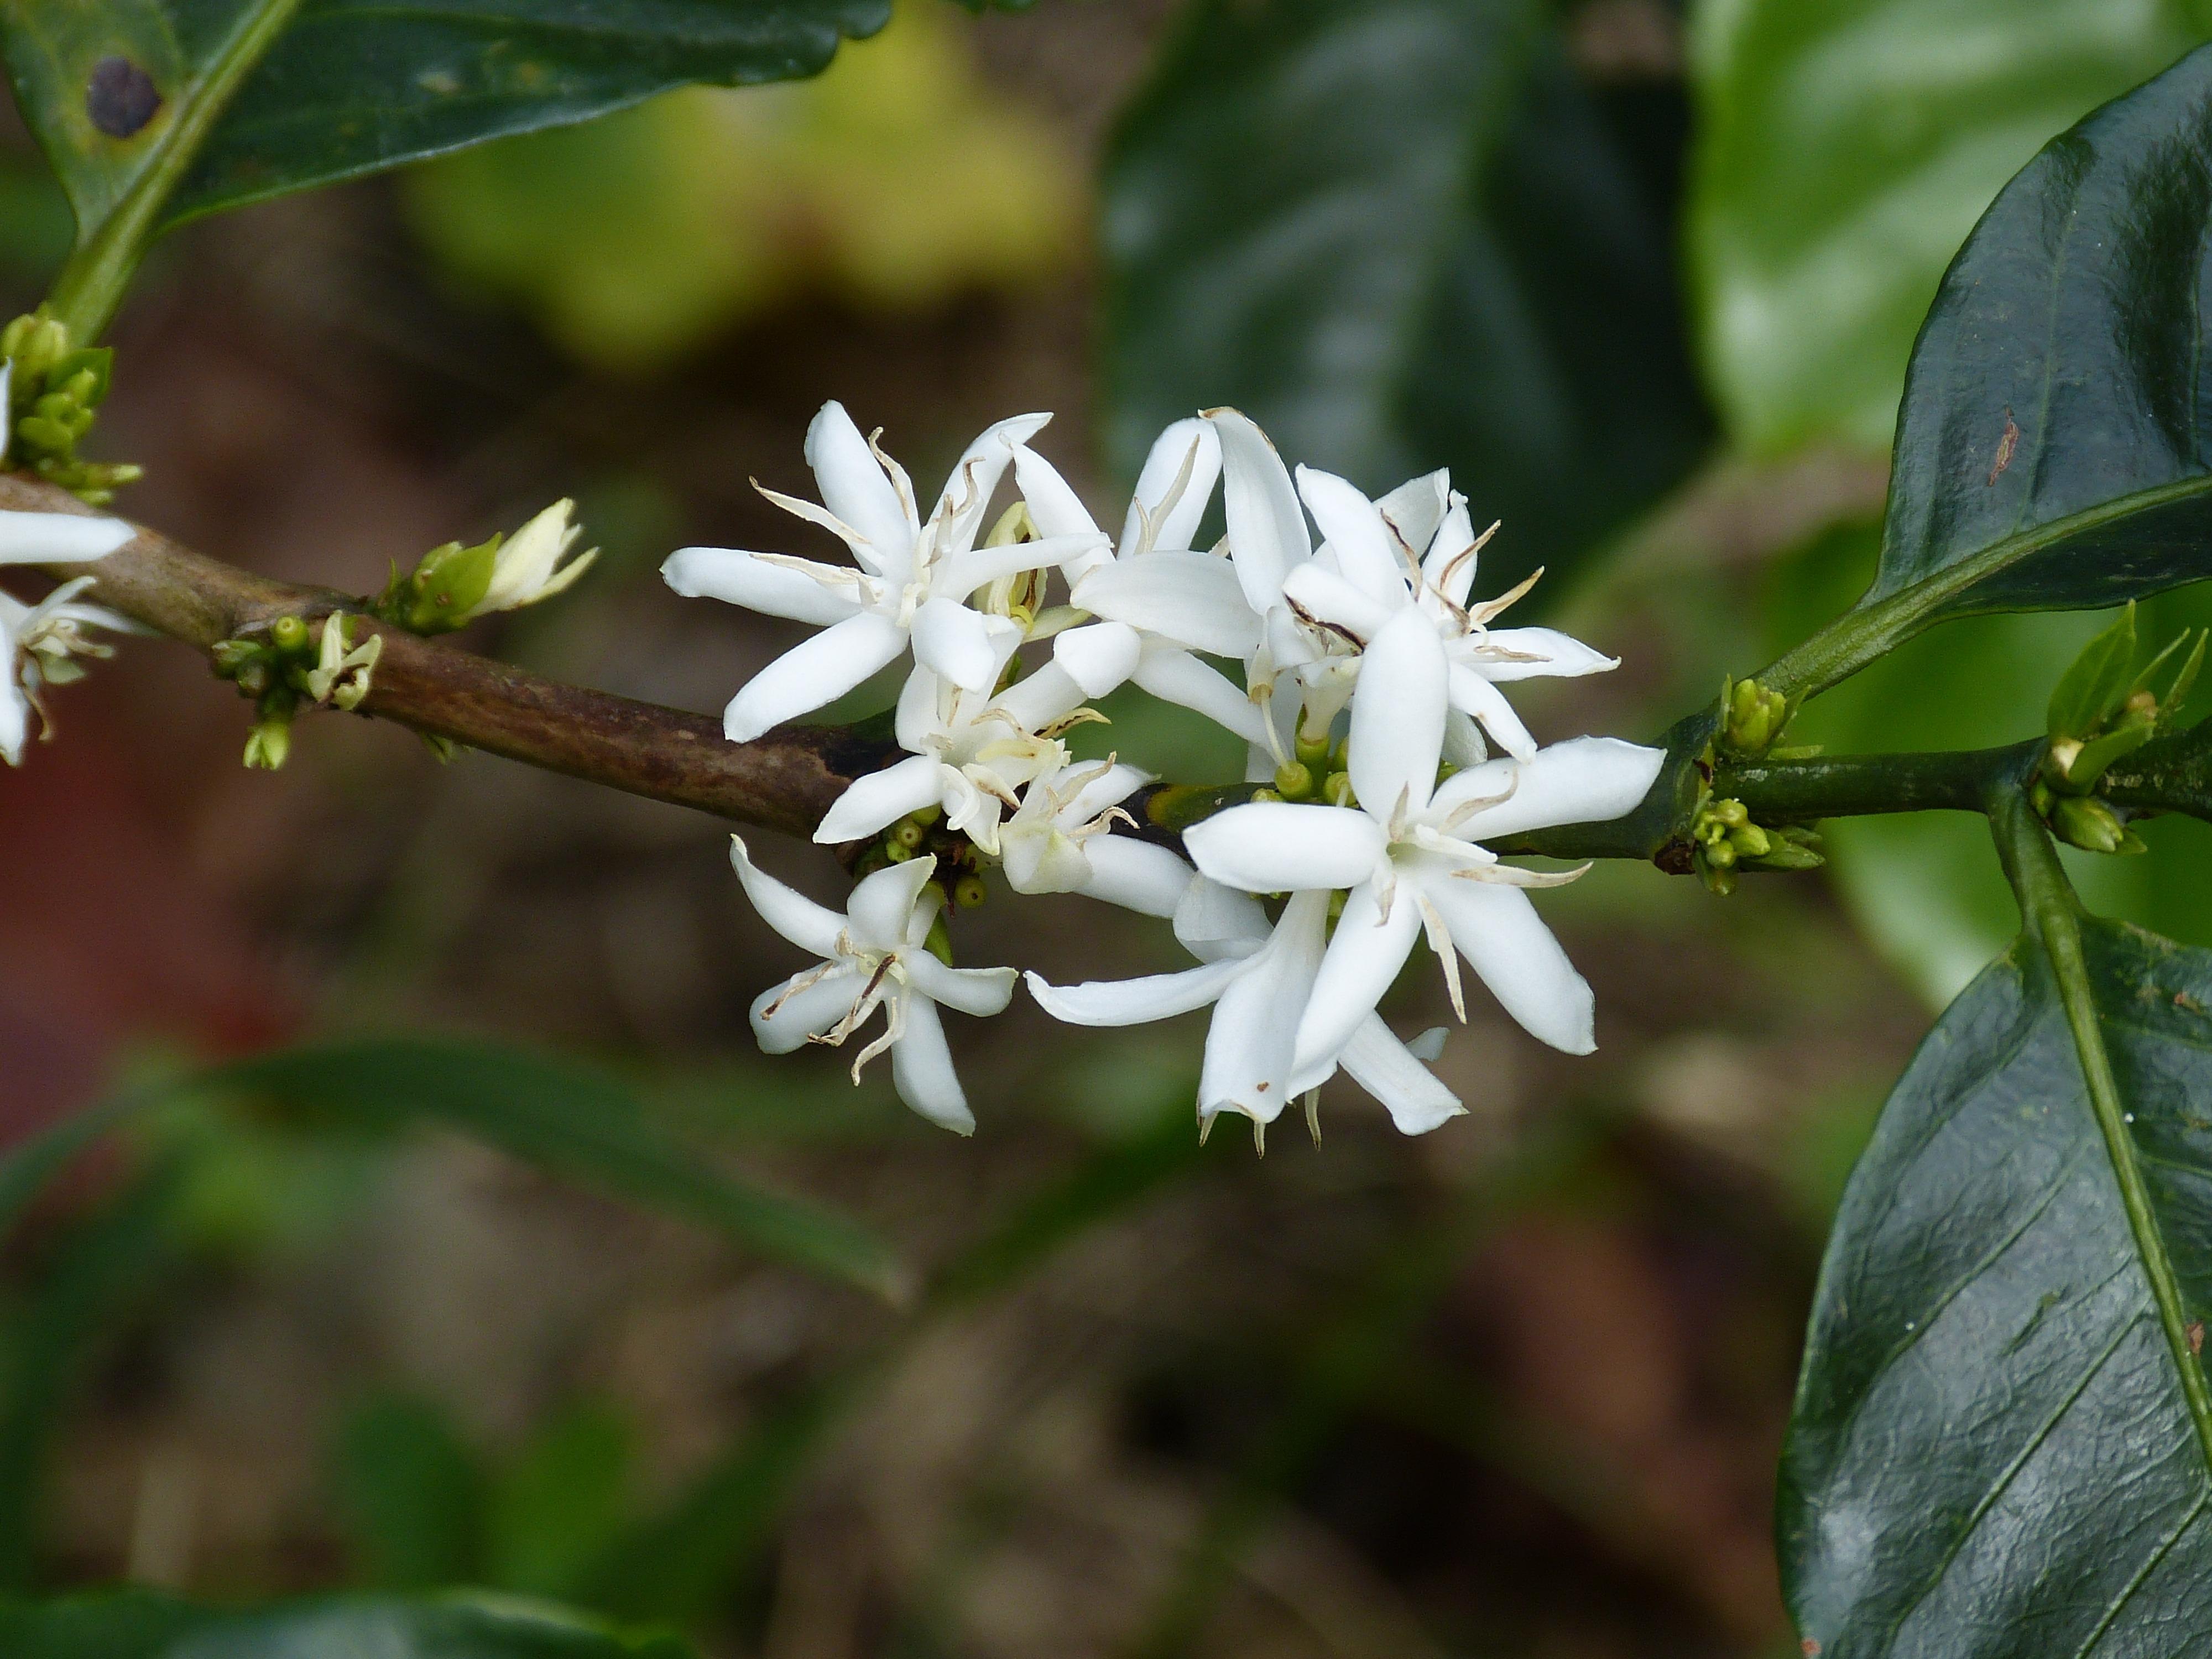 Fotos Gratis 225 Rbol Hoja Florecer Produce Hojas